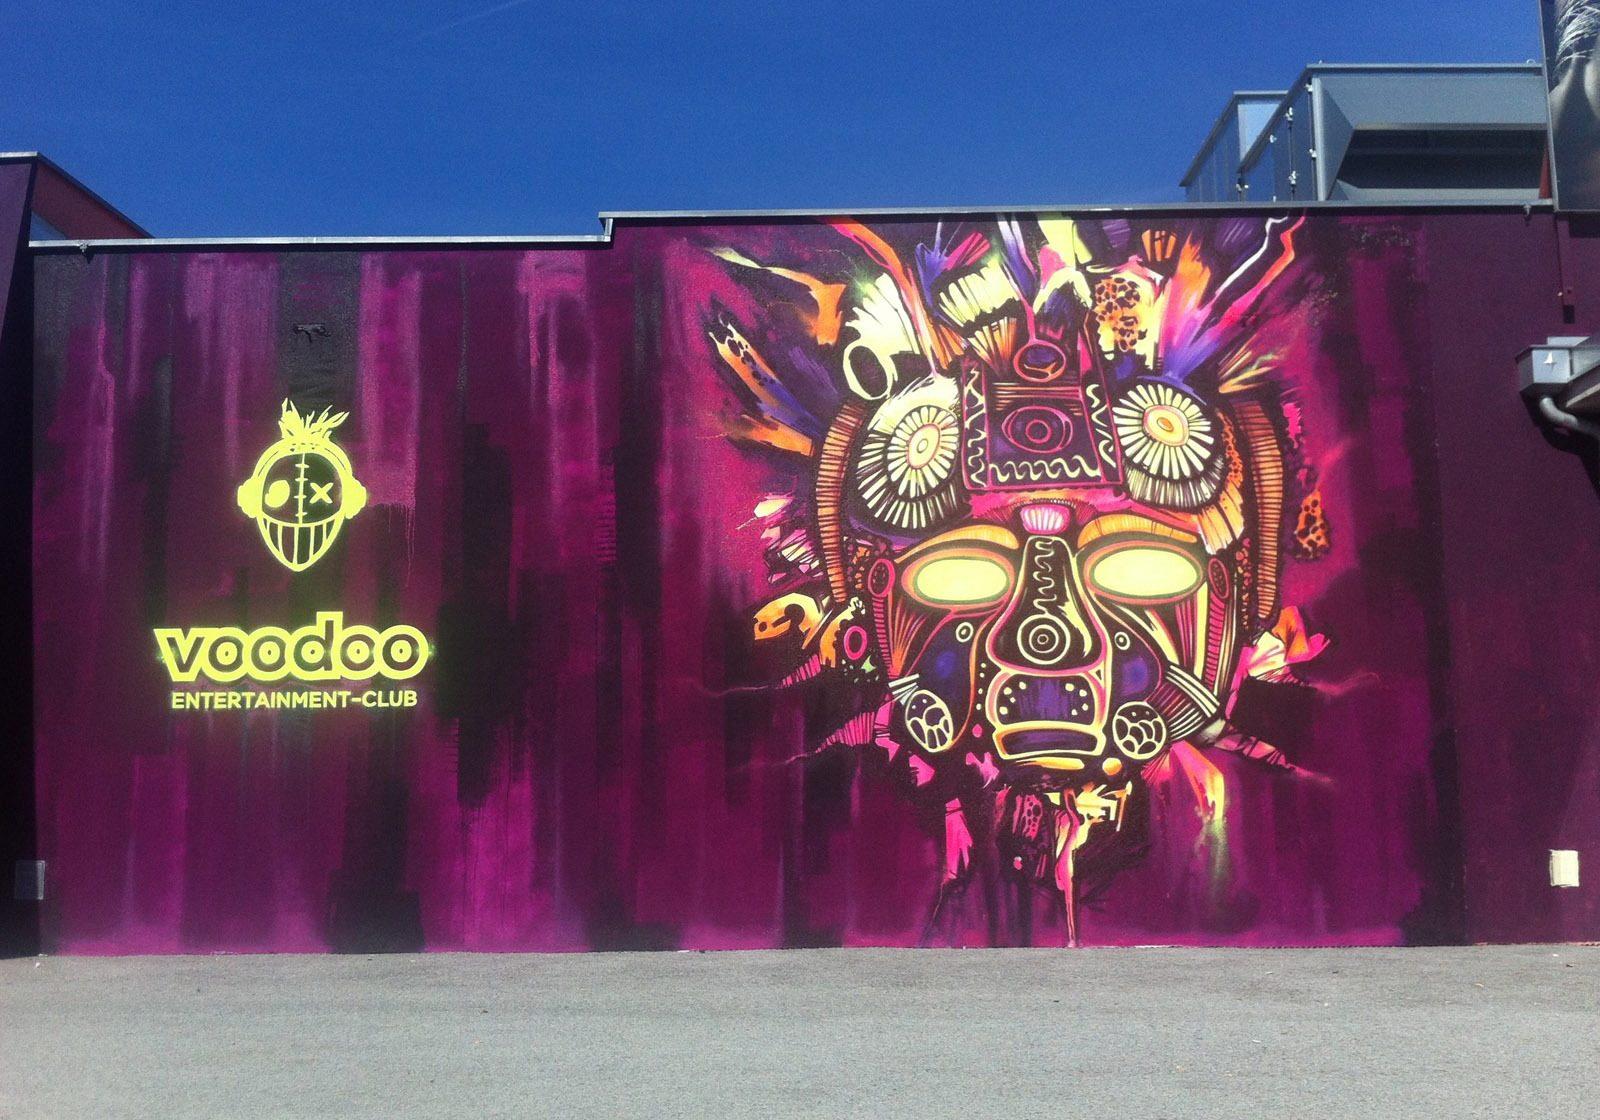 graffitiauftrag-graffitikuenstler-artmos4-voodoo-disco-fassadengestaltung-maske-neon